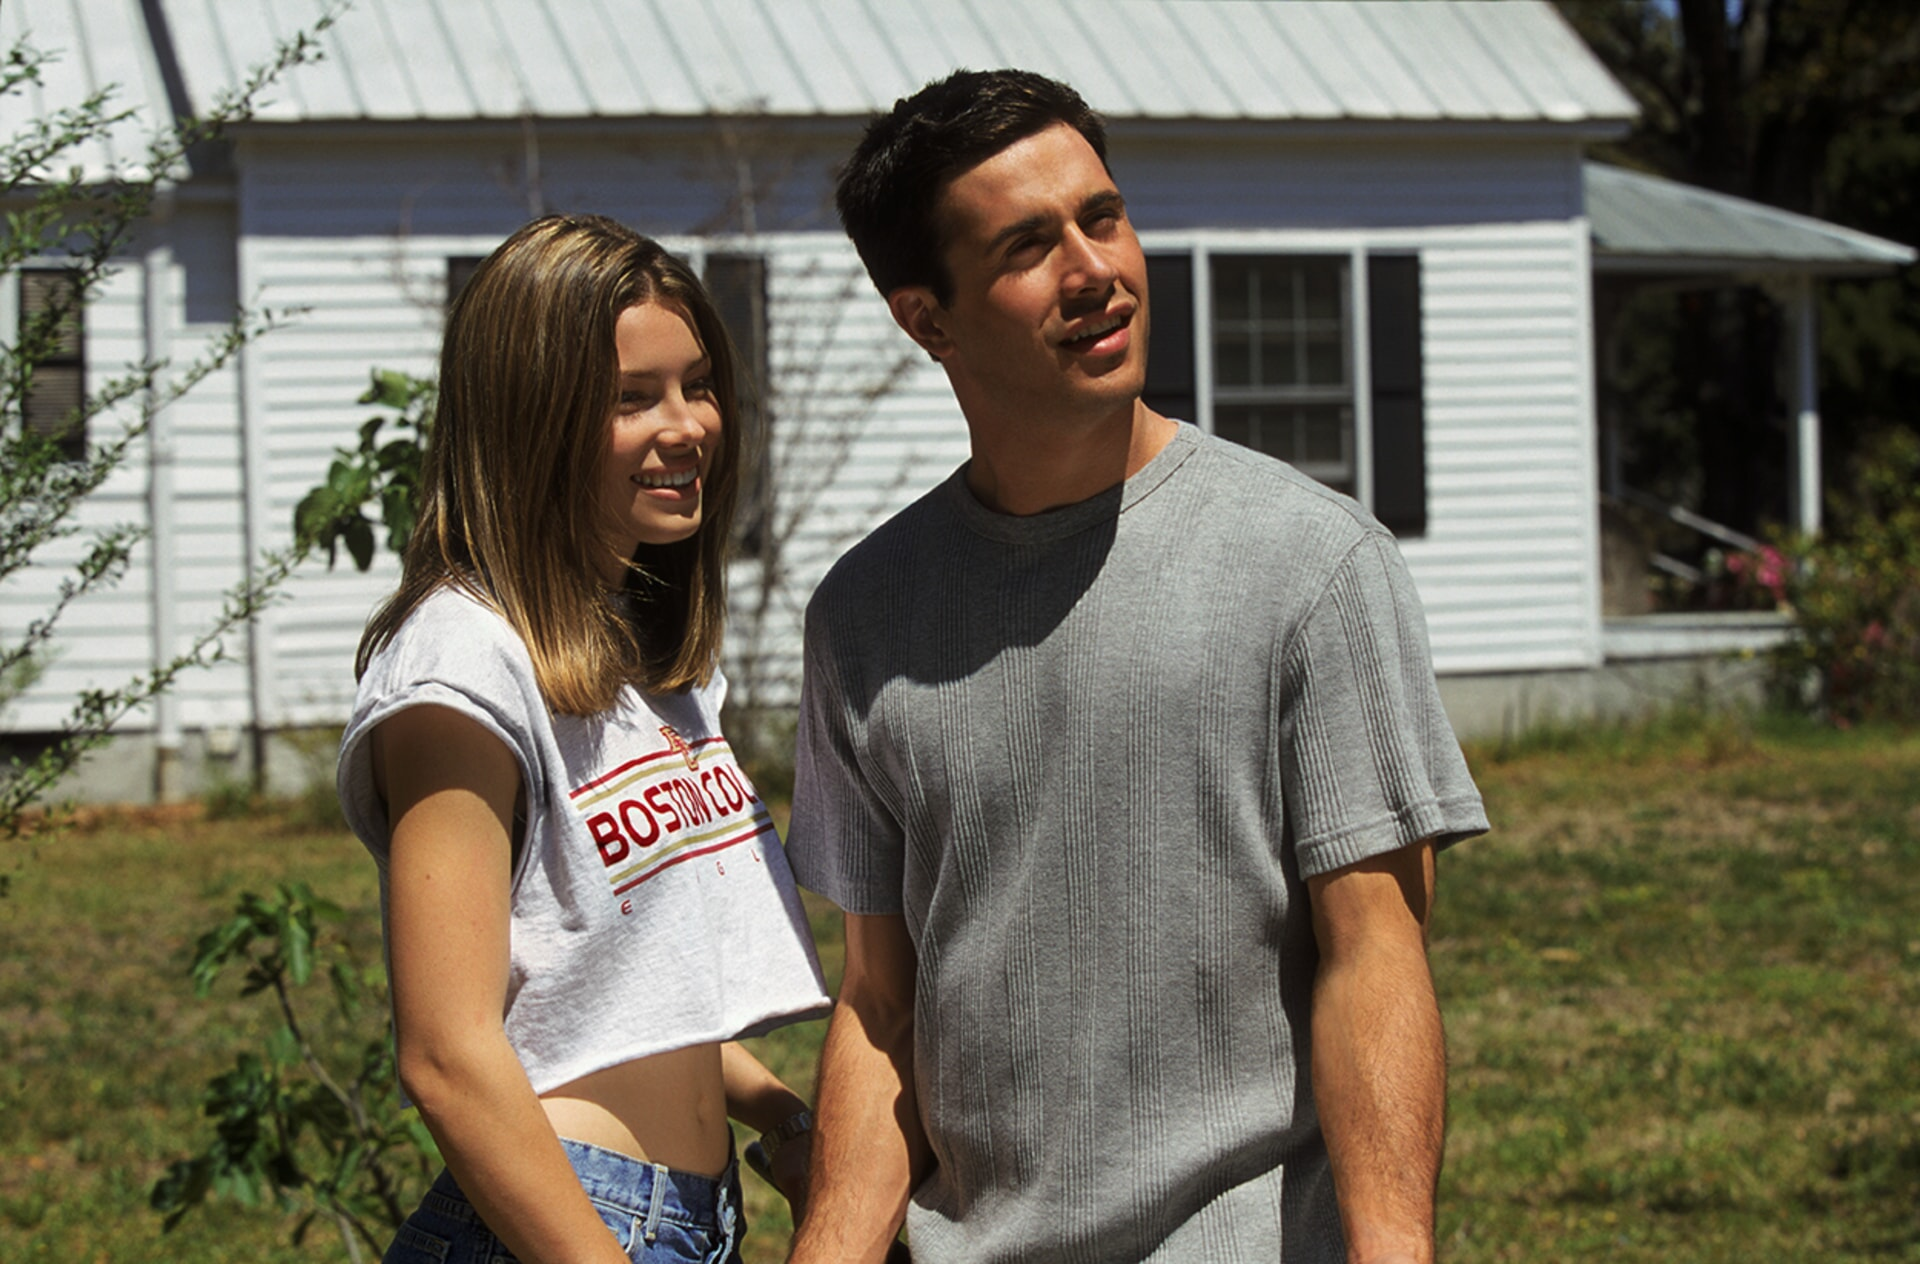 jessica biel and freddie prinze jr. star in summer catch